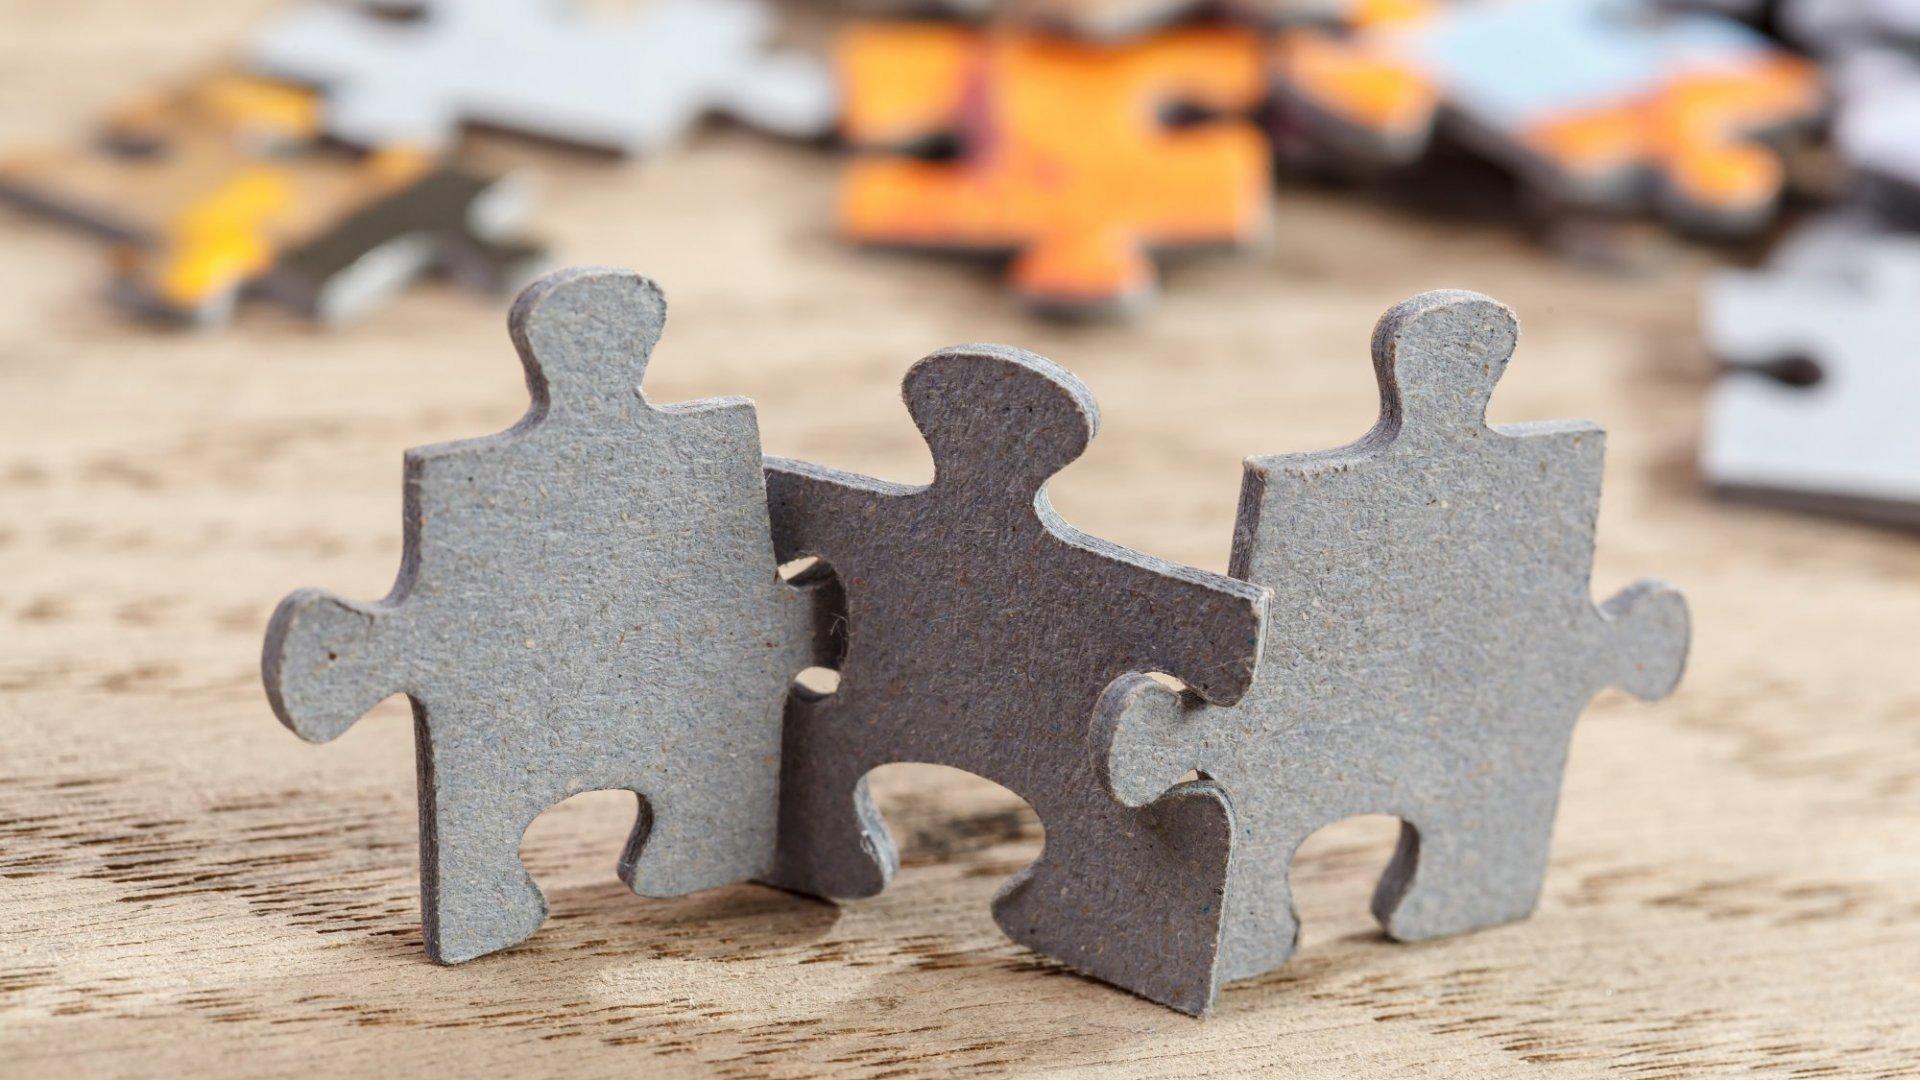 Creating Success Through Online Business Partnerships